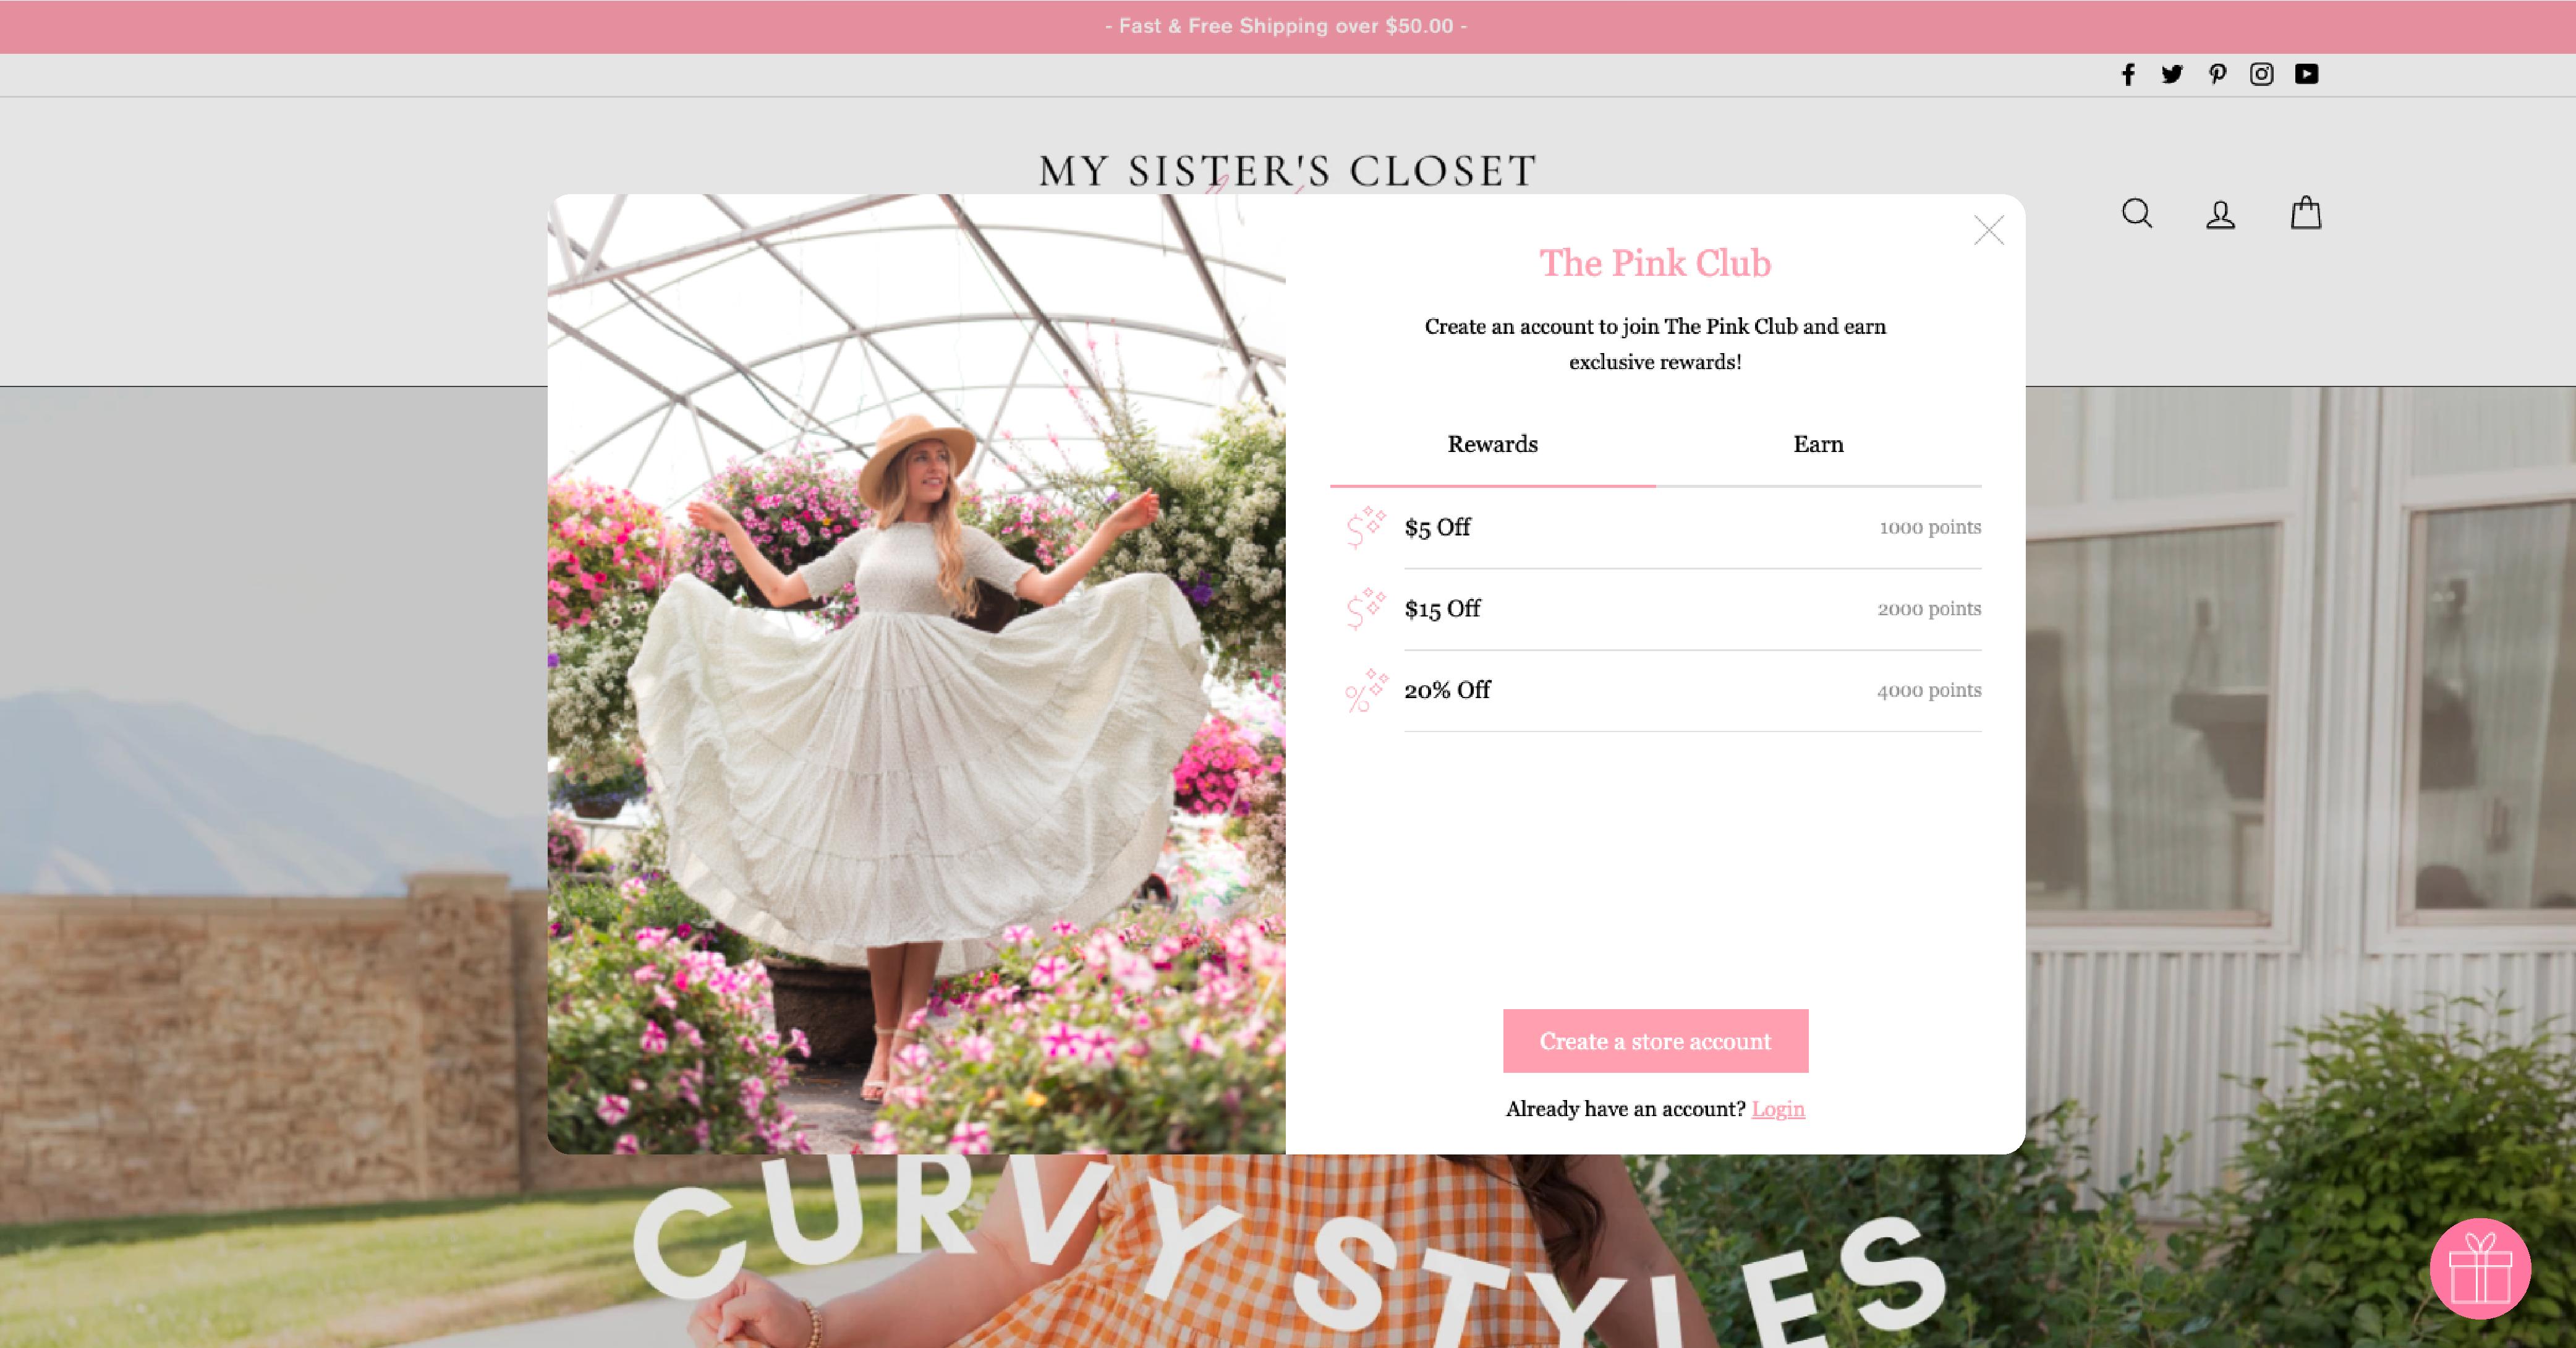 My Sister's Closet's on-website loyalty widget